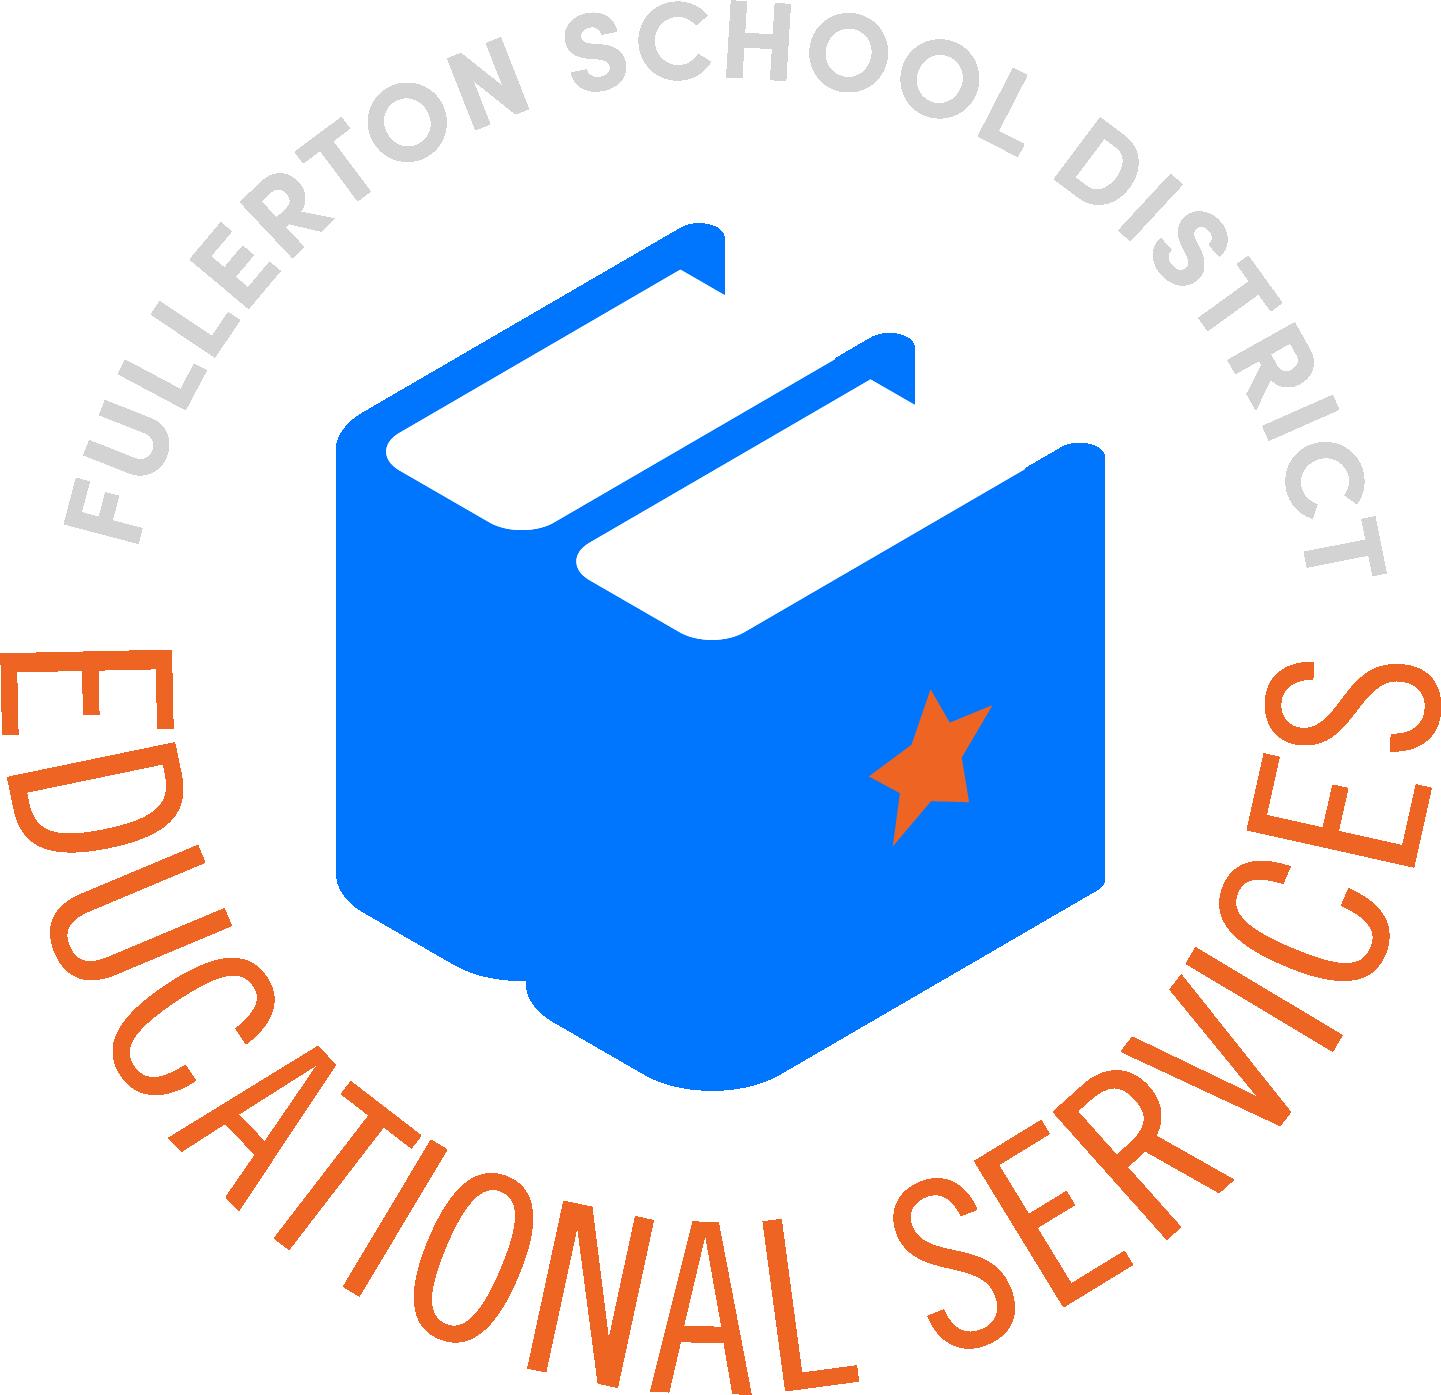 Fullerton School District Educational Services